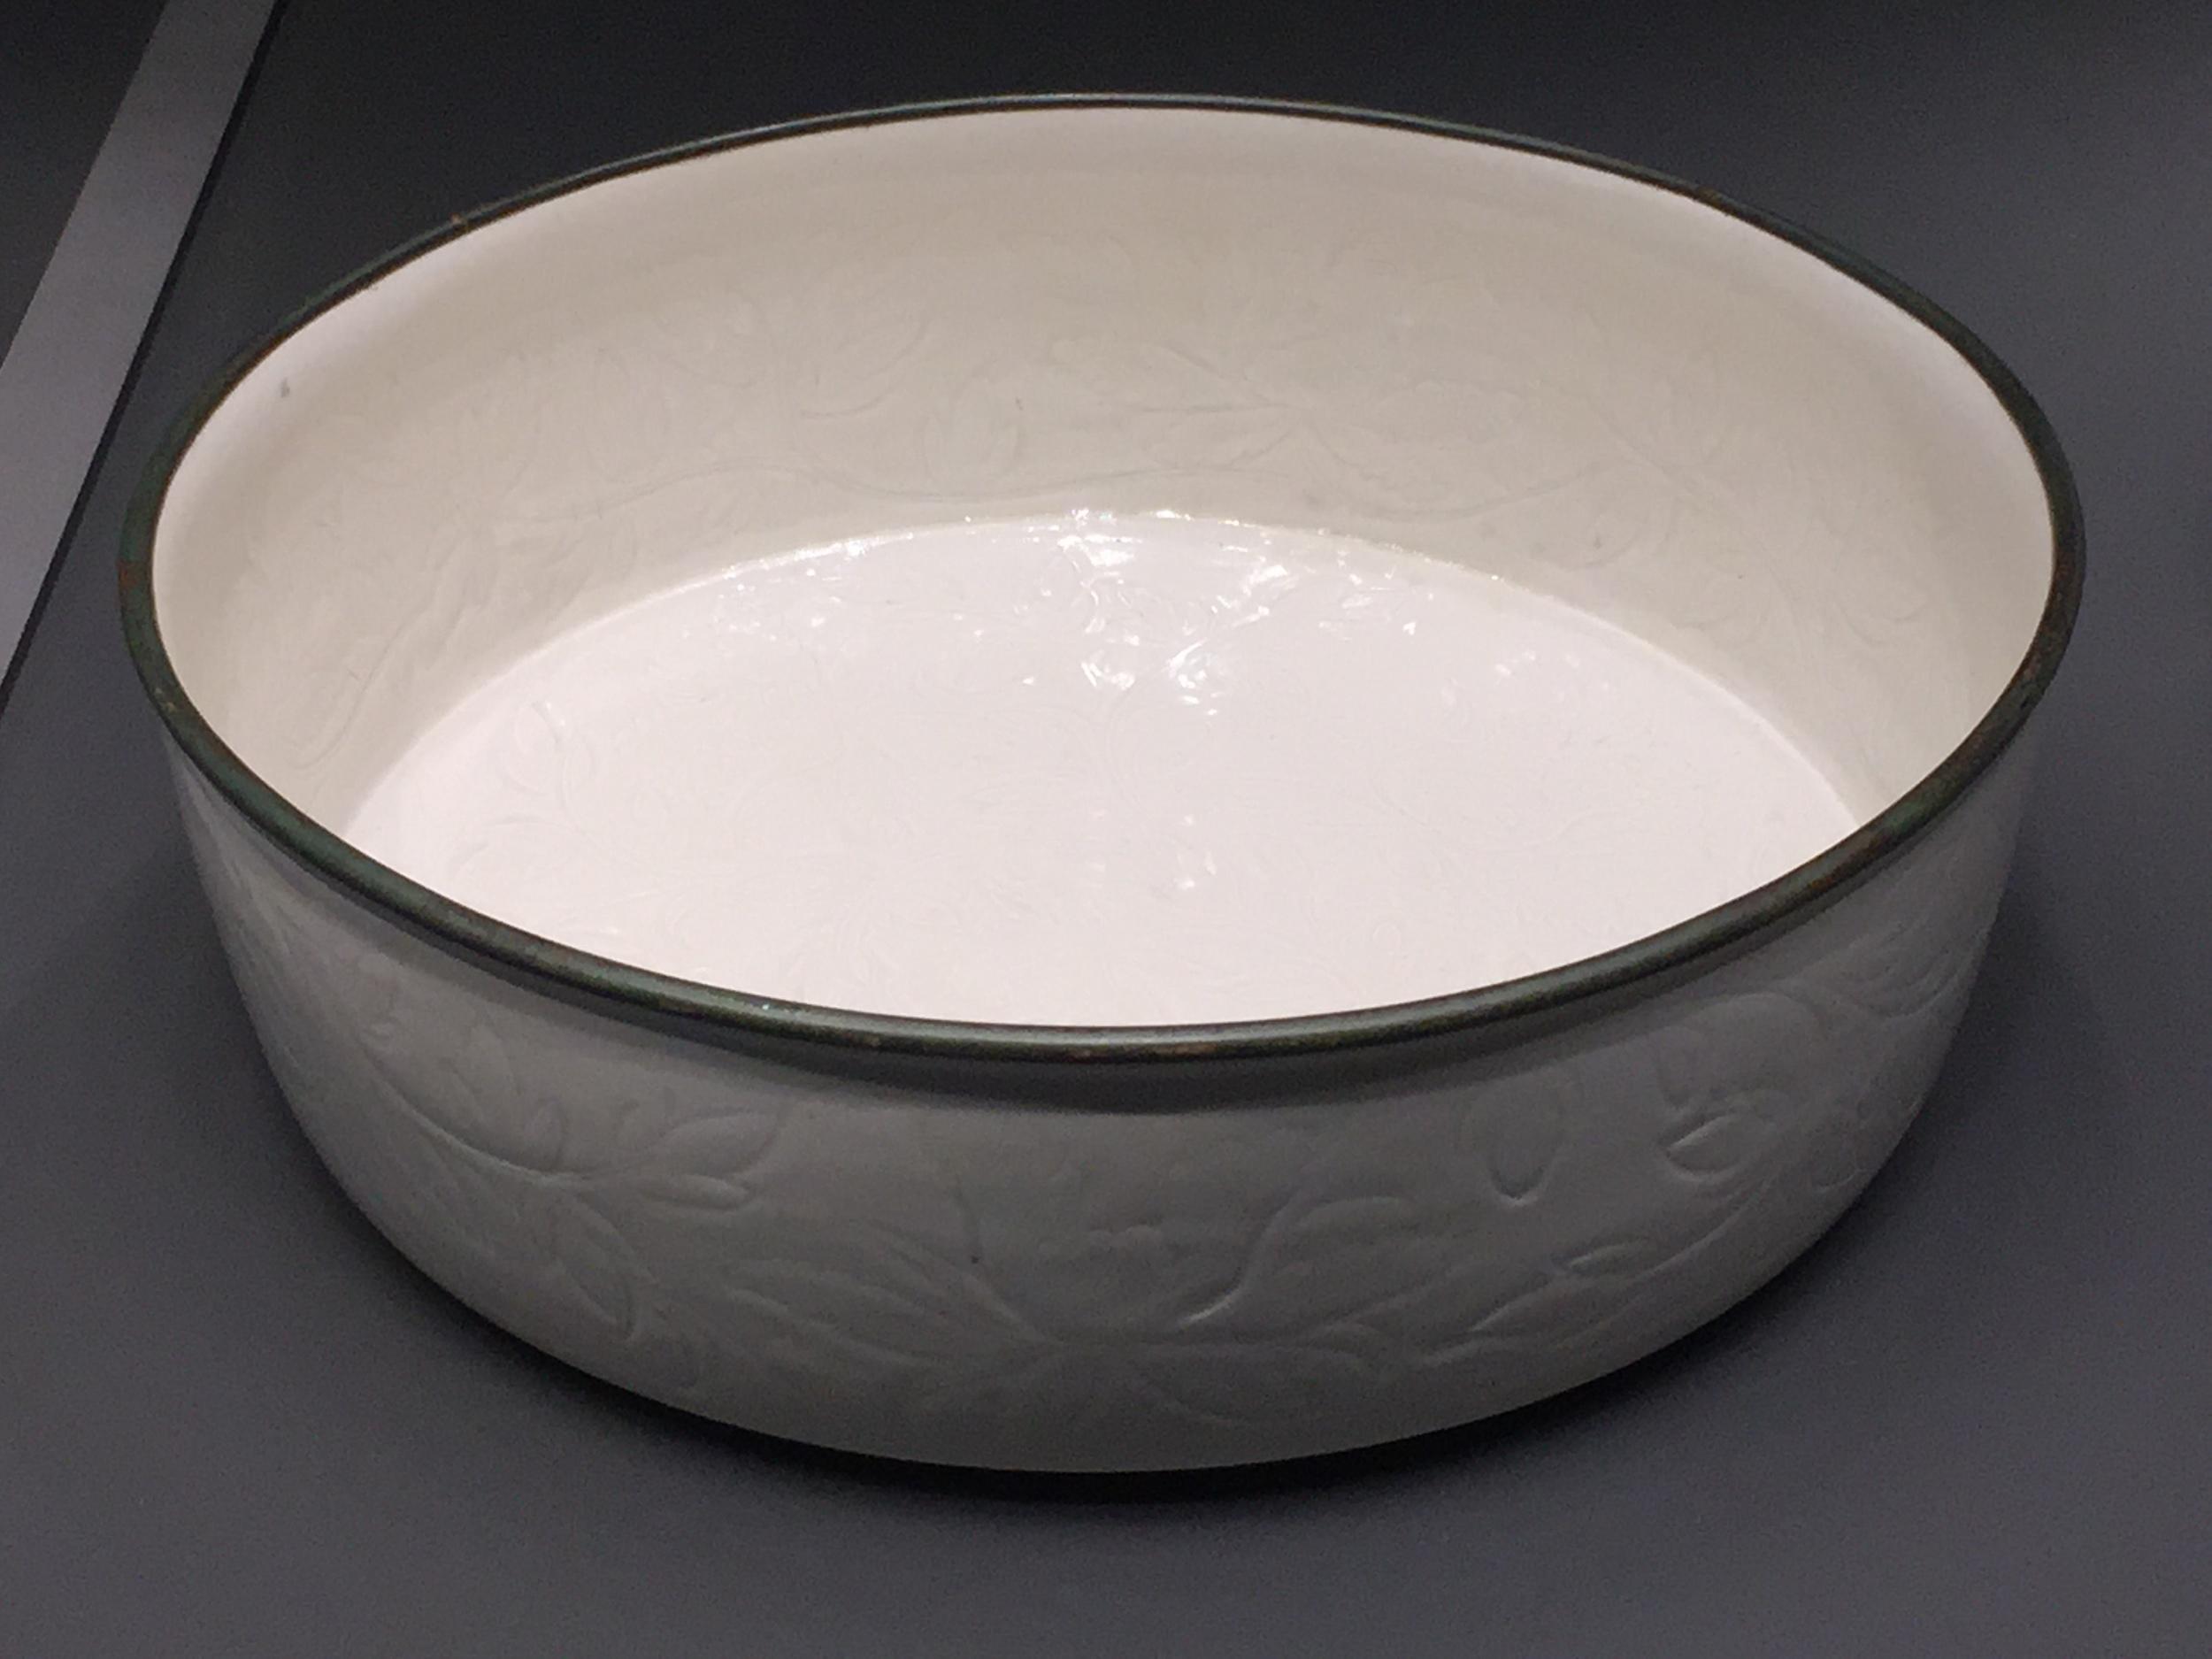 Chinese-Porcelain-British-Museum-Percival-David-jessewaugh.com-7.jpg